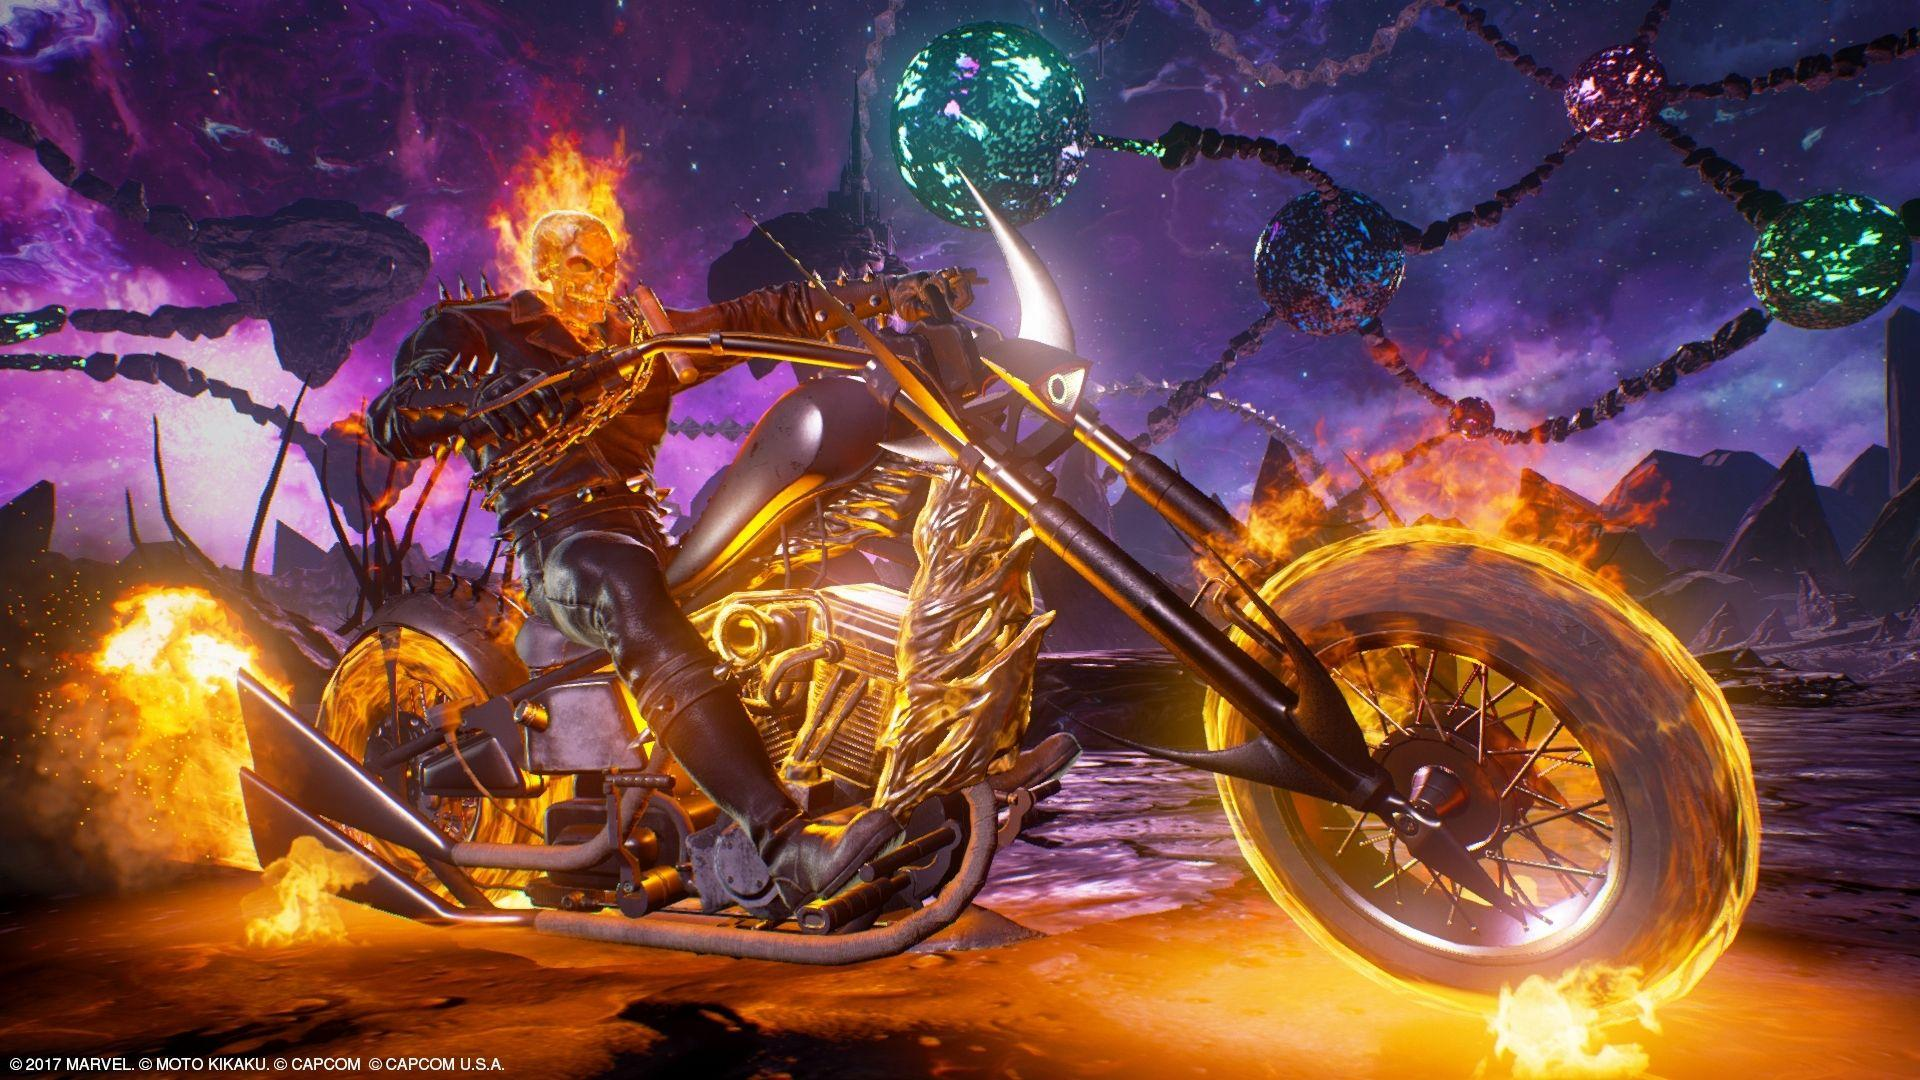 Ghost Rider Bike Wallpapers Hd Wallpaper Cave